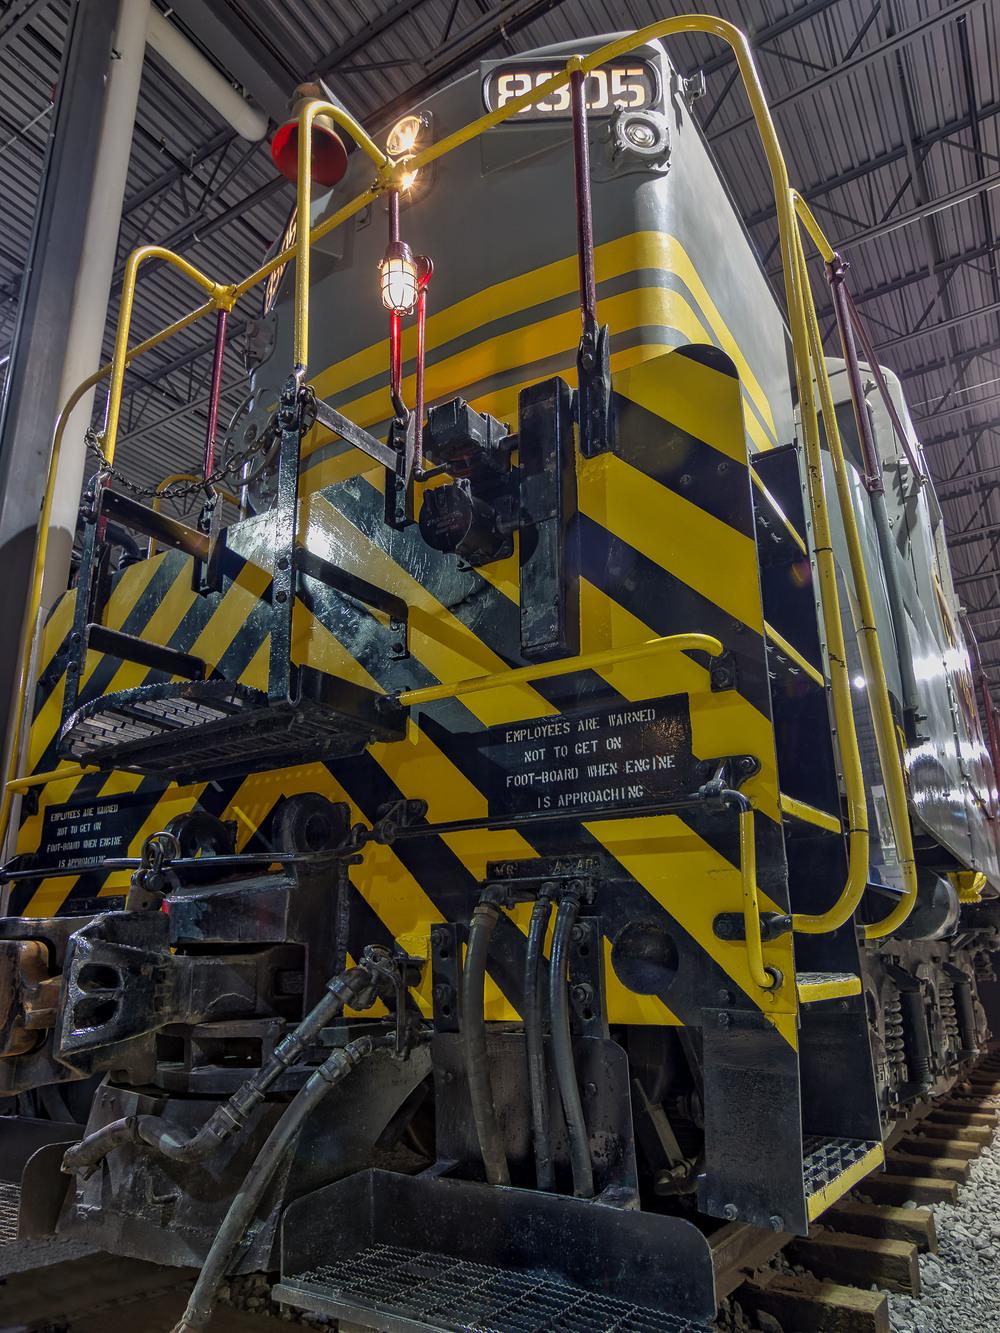 Exporail Train Museum-9_AuroraHDR_HDR-Edit.jpg